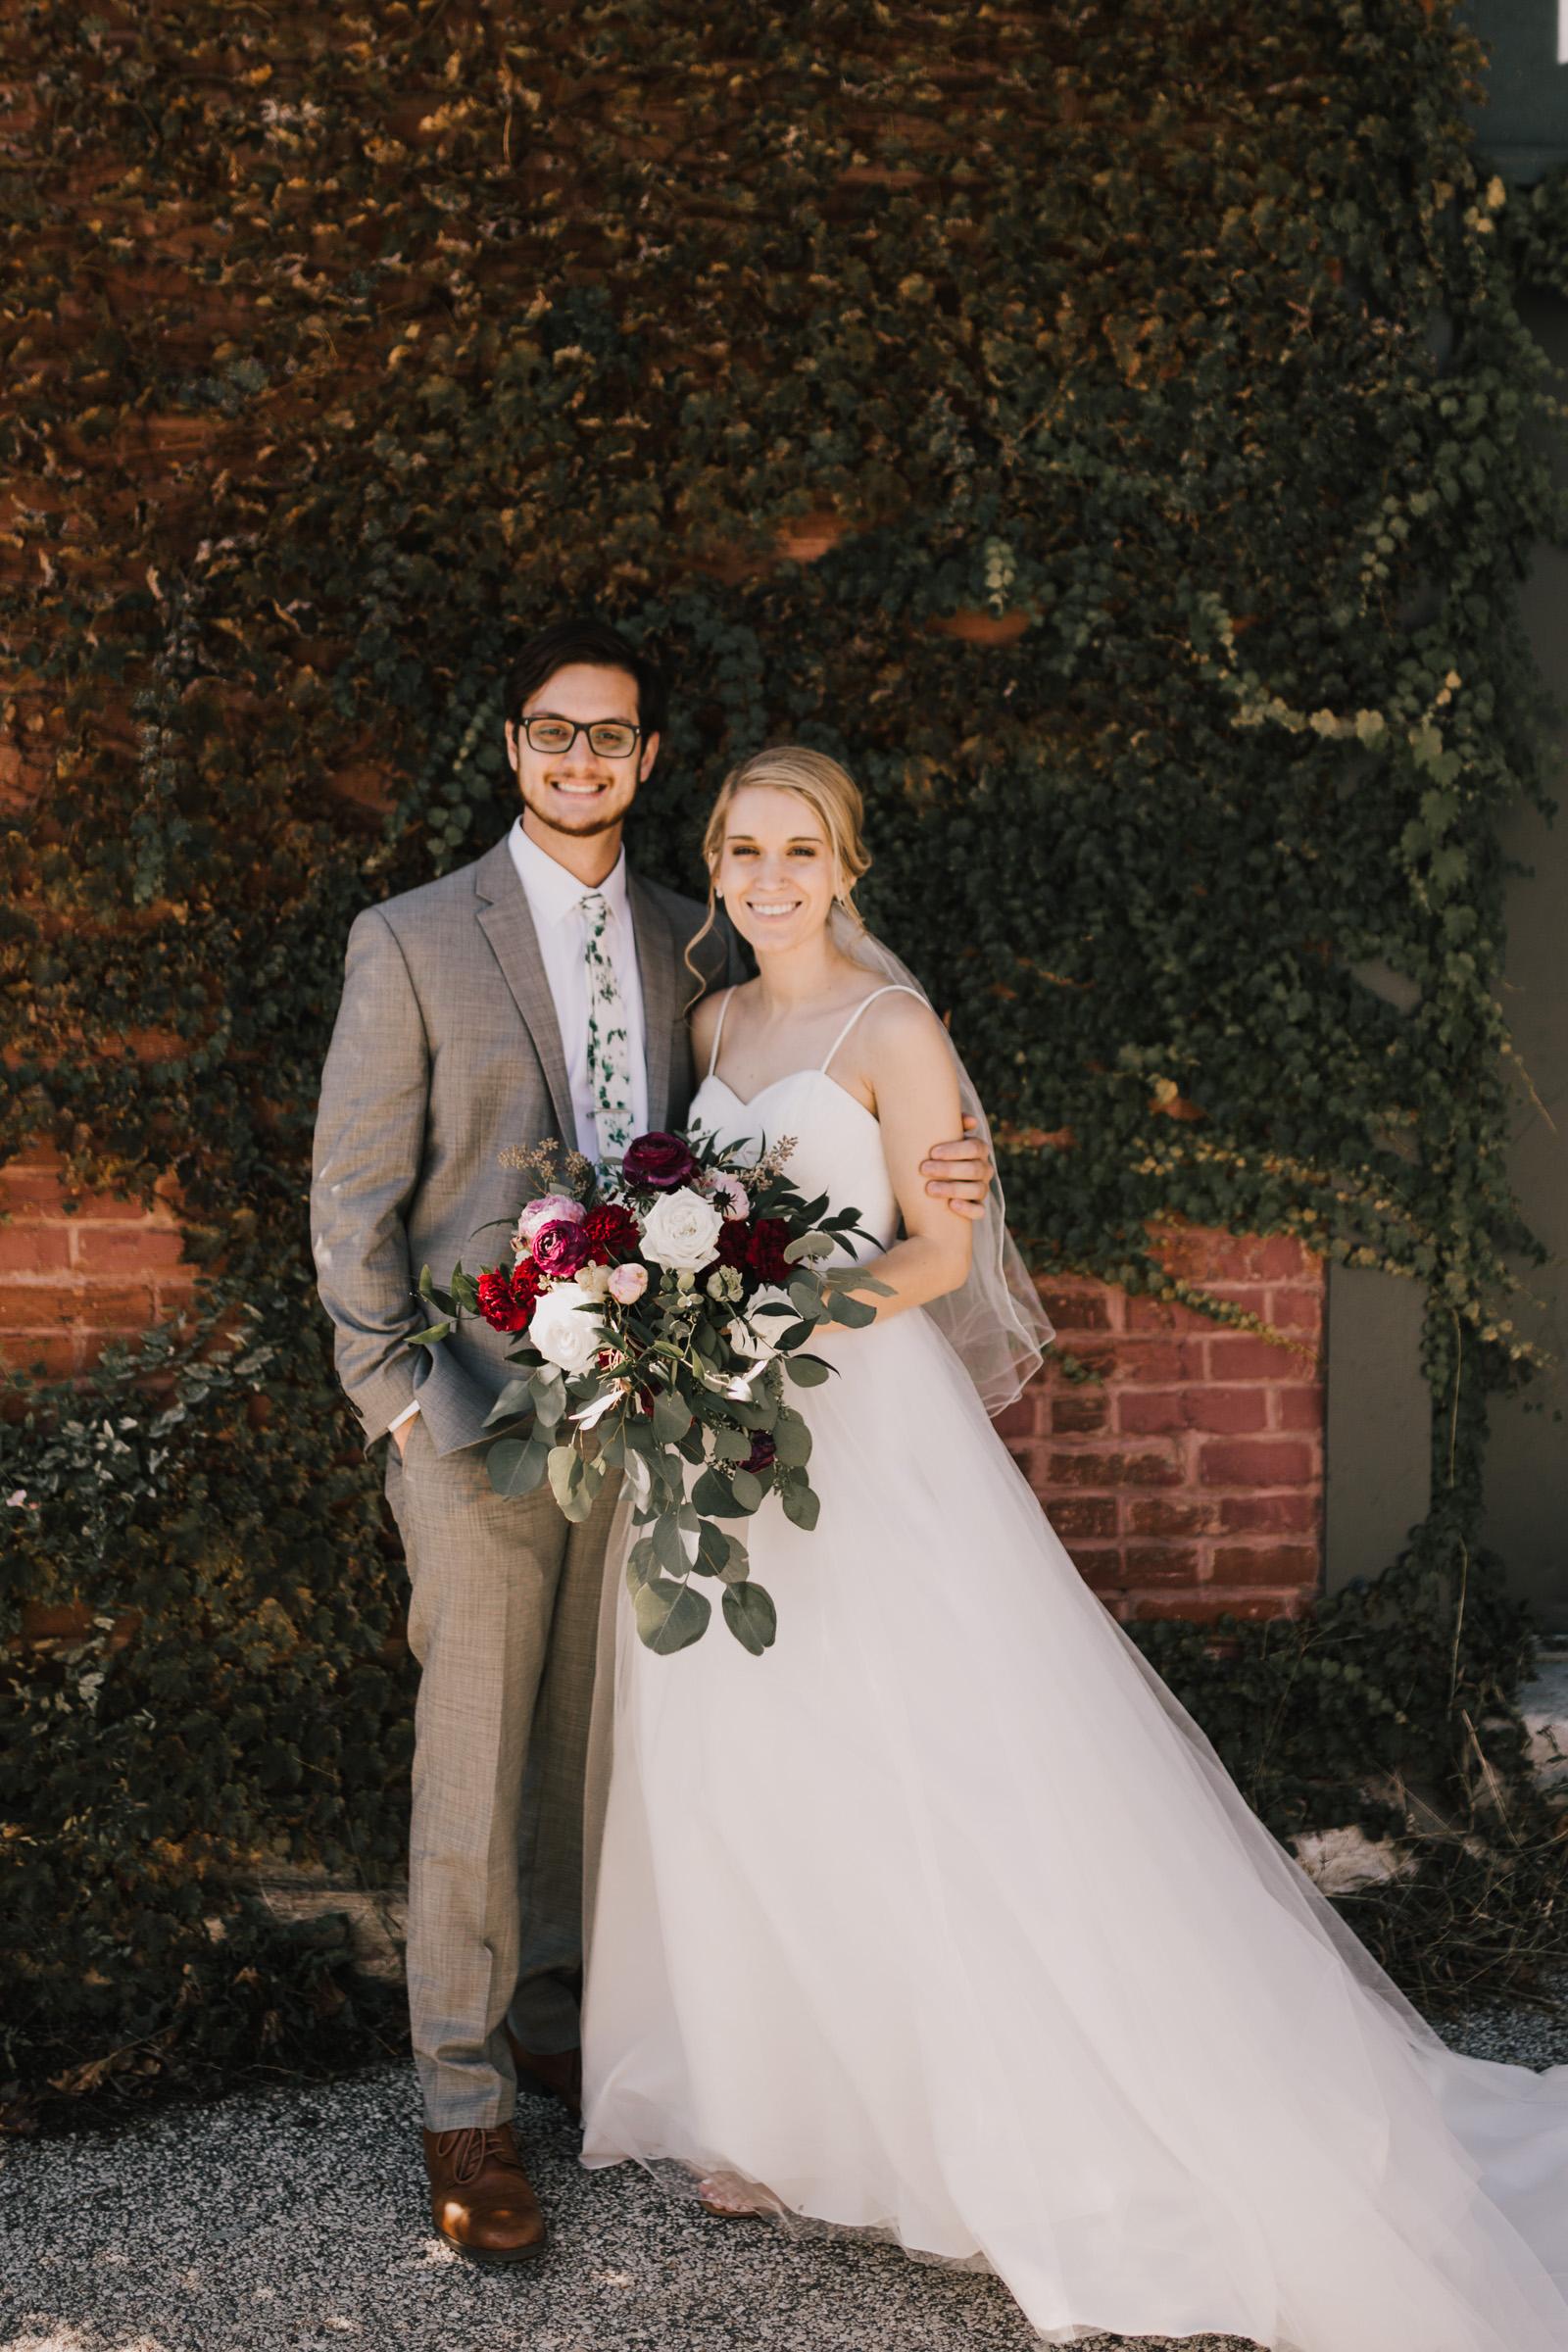 alyssa barletter photography midtown kansas city wedding el torreon kcmo fall october wedding photography-19.jpg